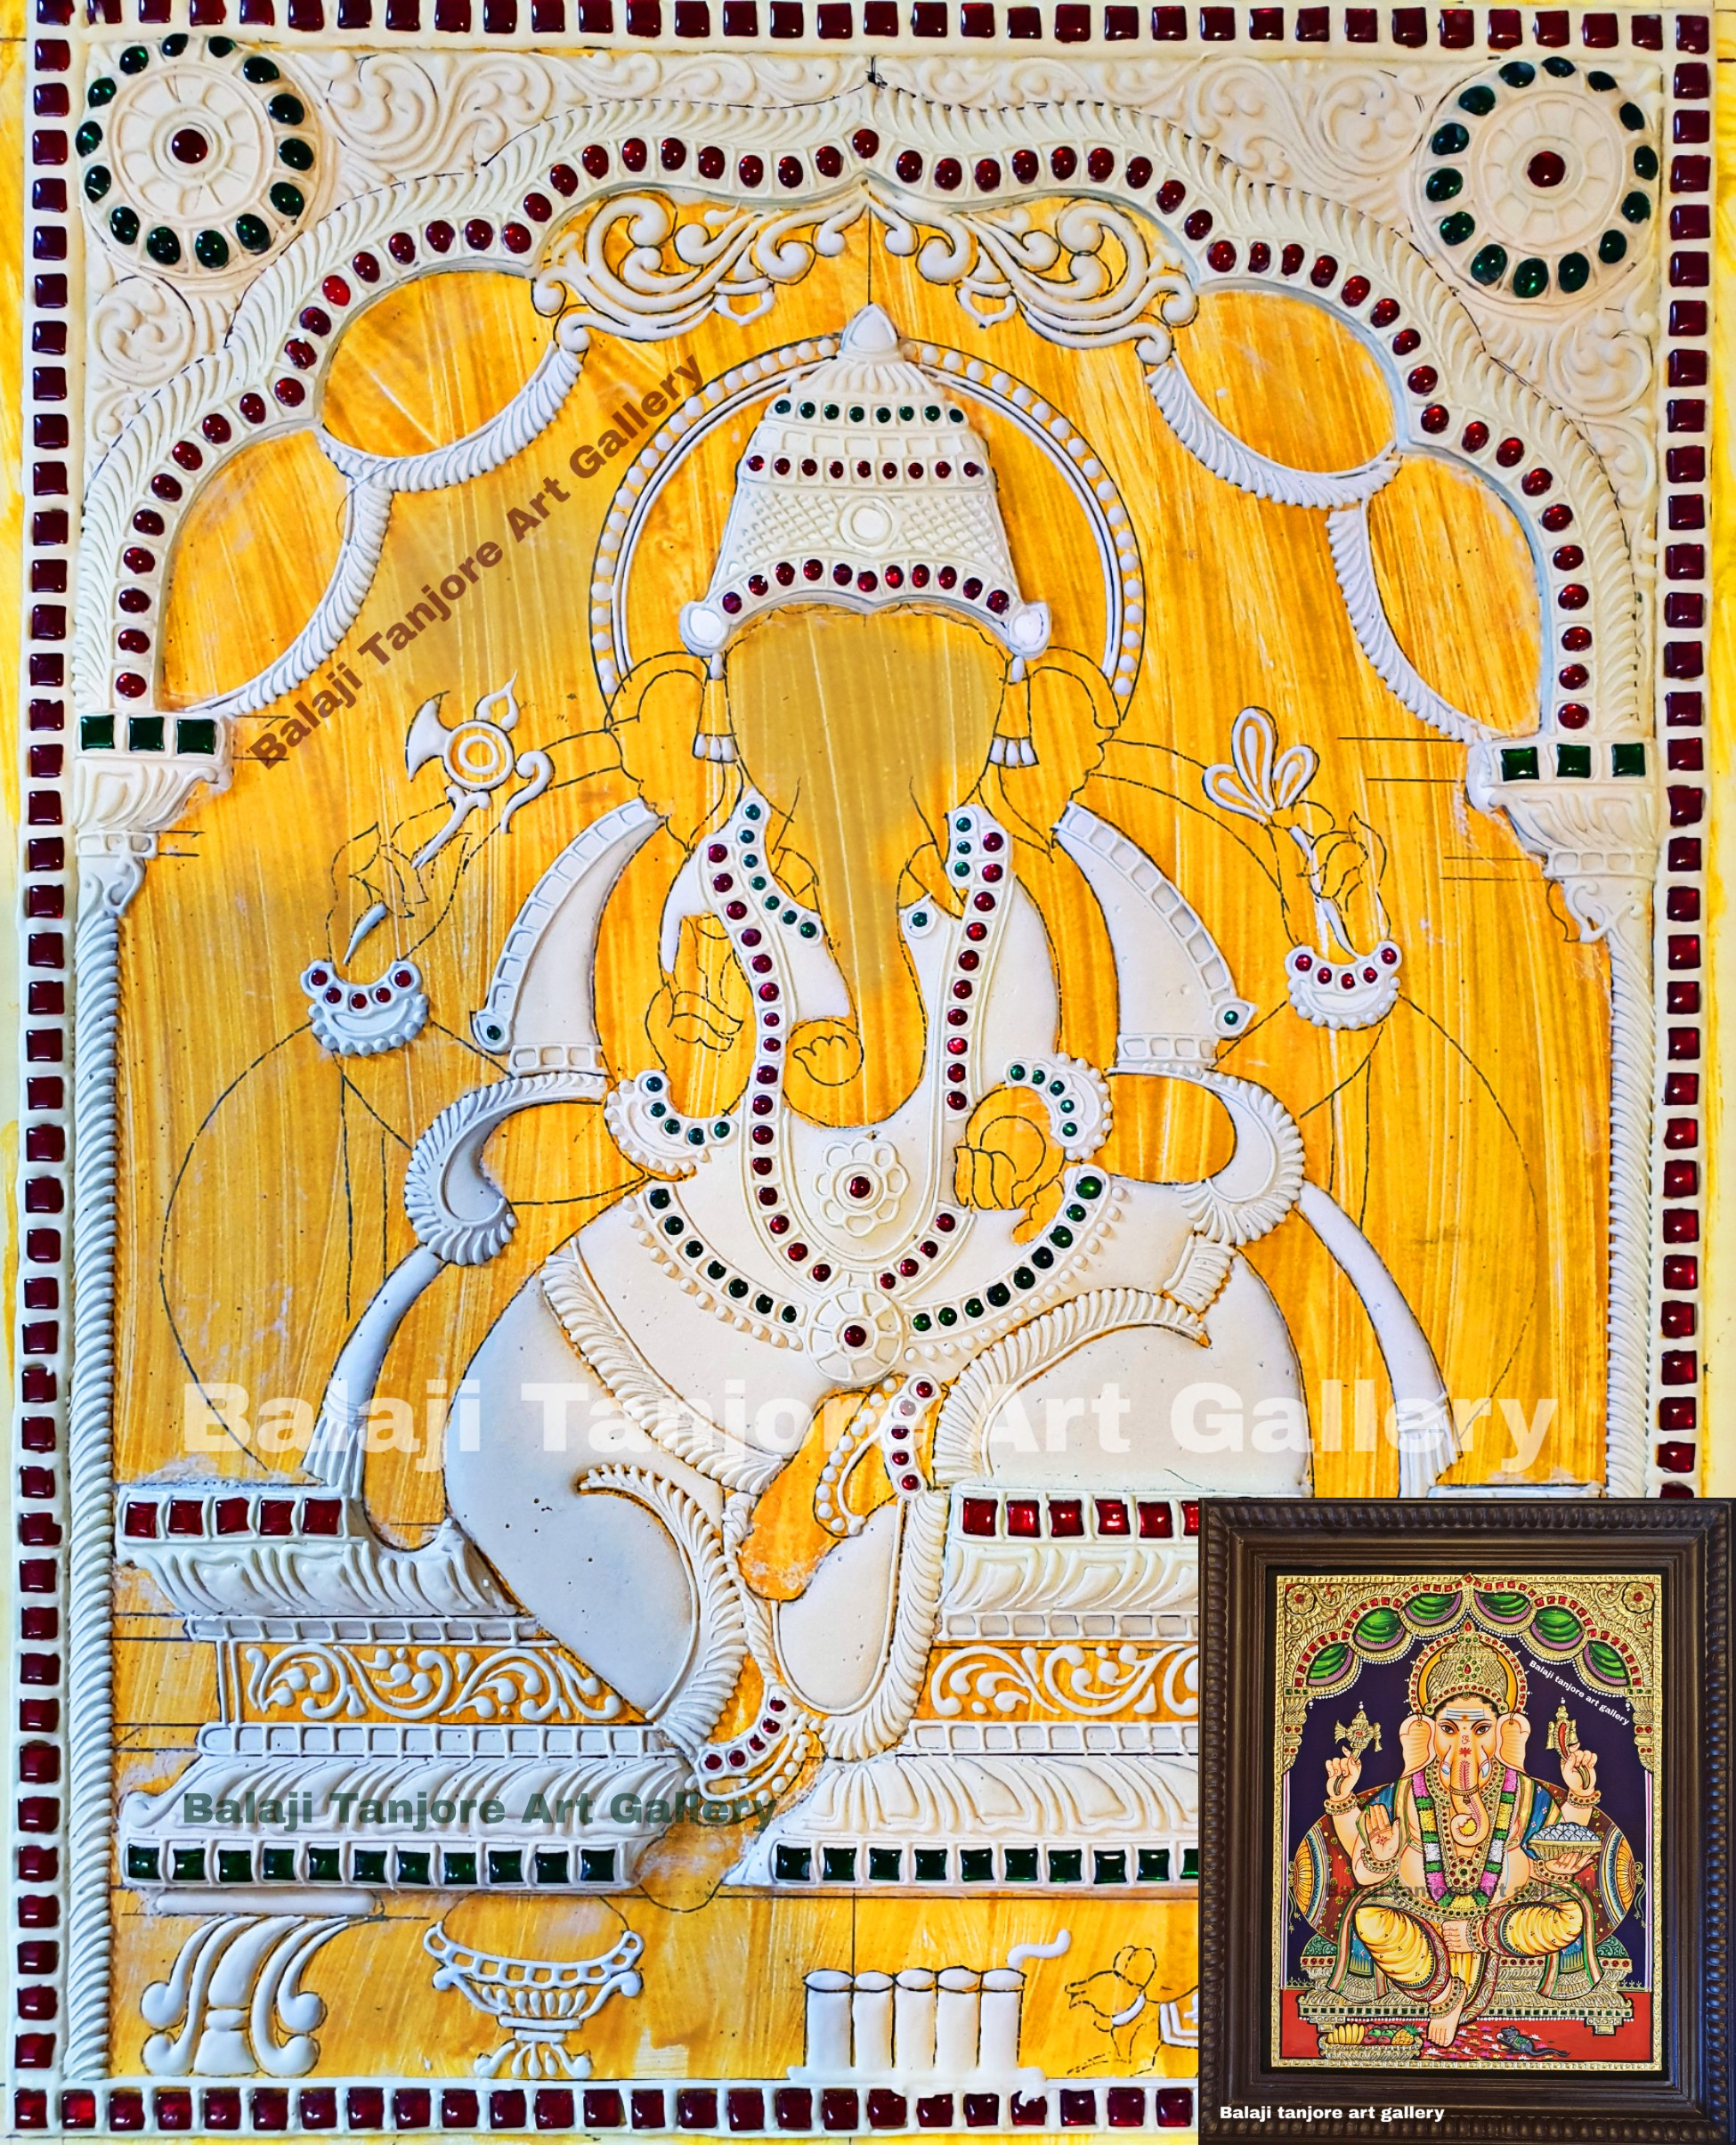 ganesha mukk board for tanjore painting